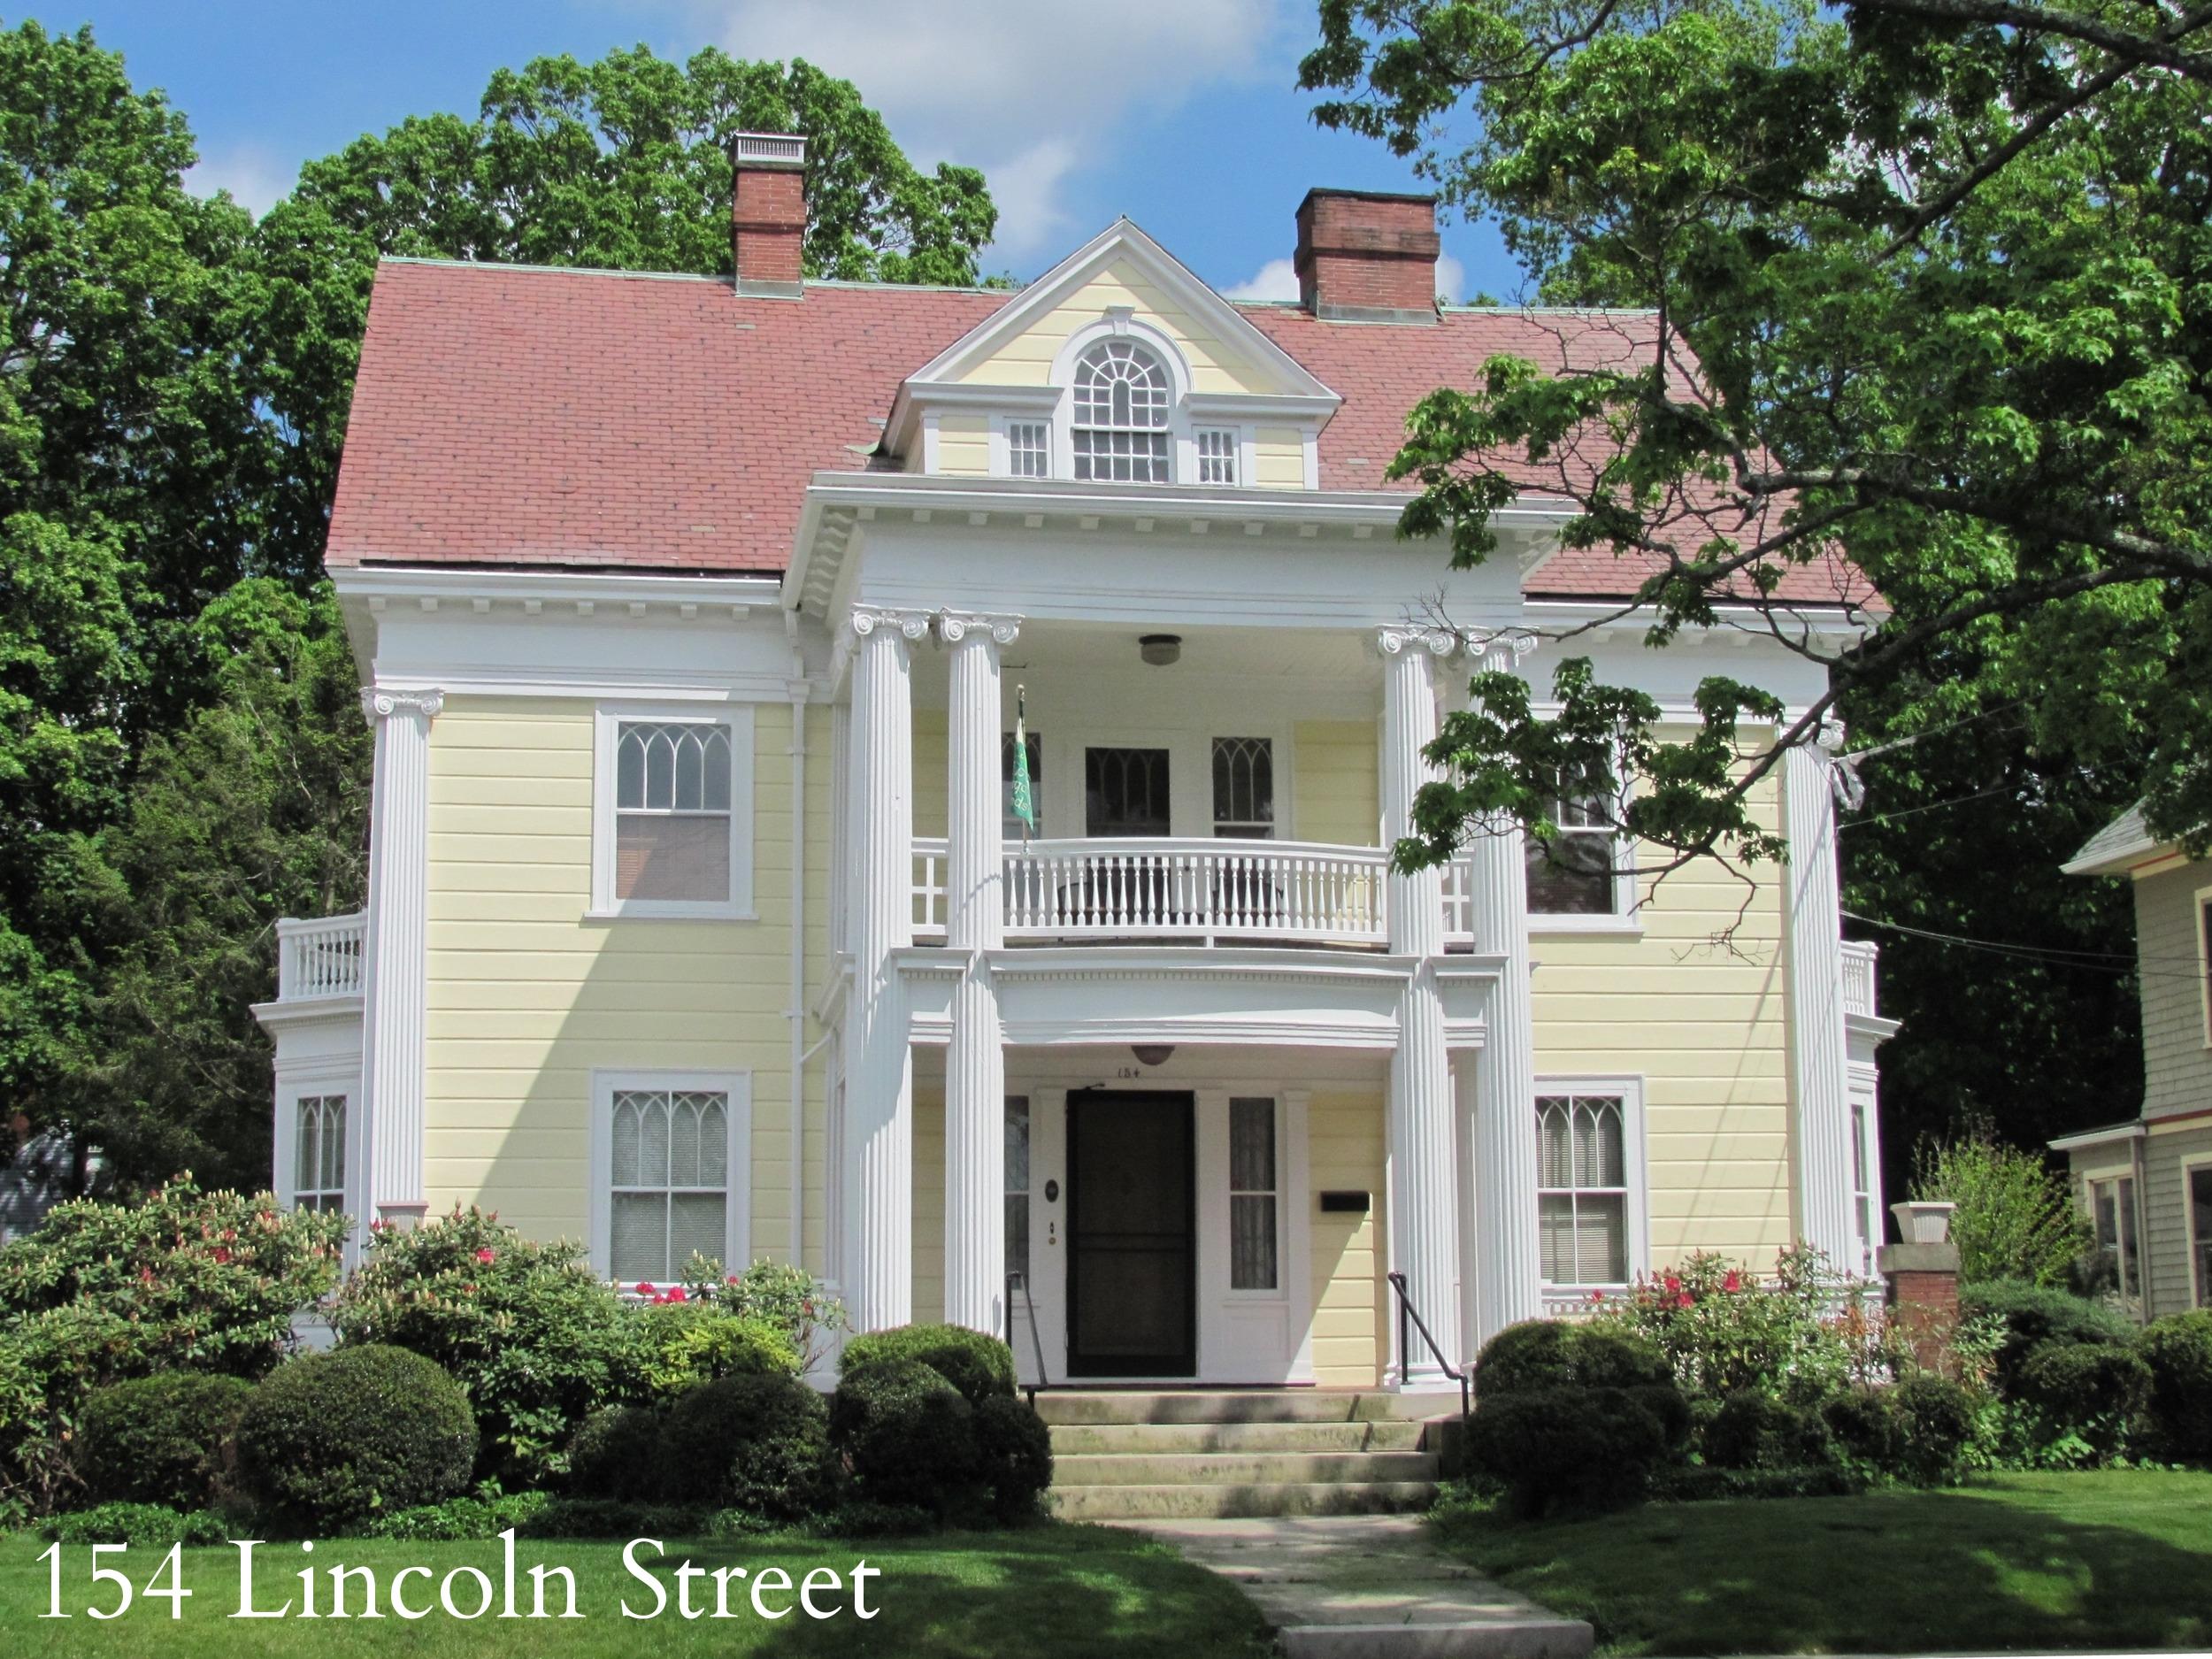 154 Lincoln Street.jpg